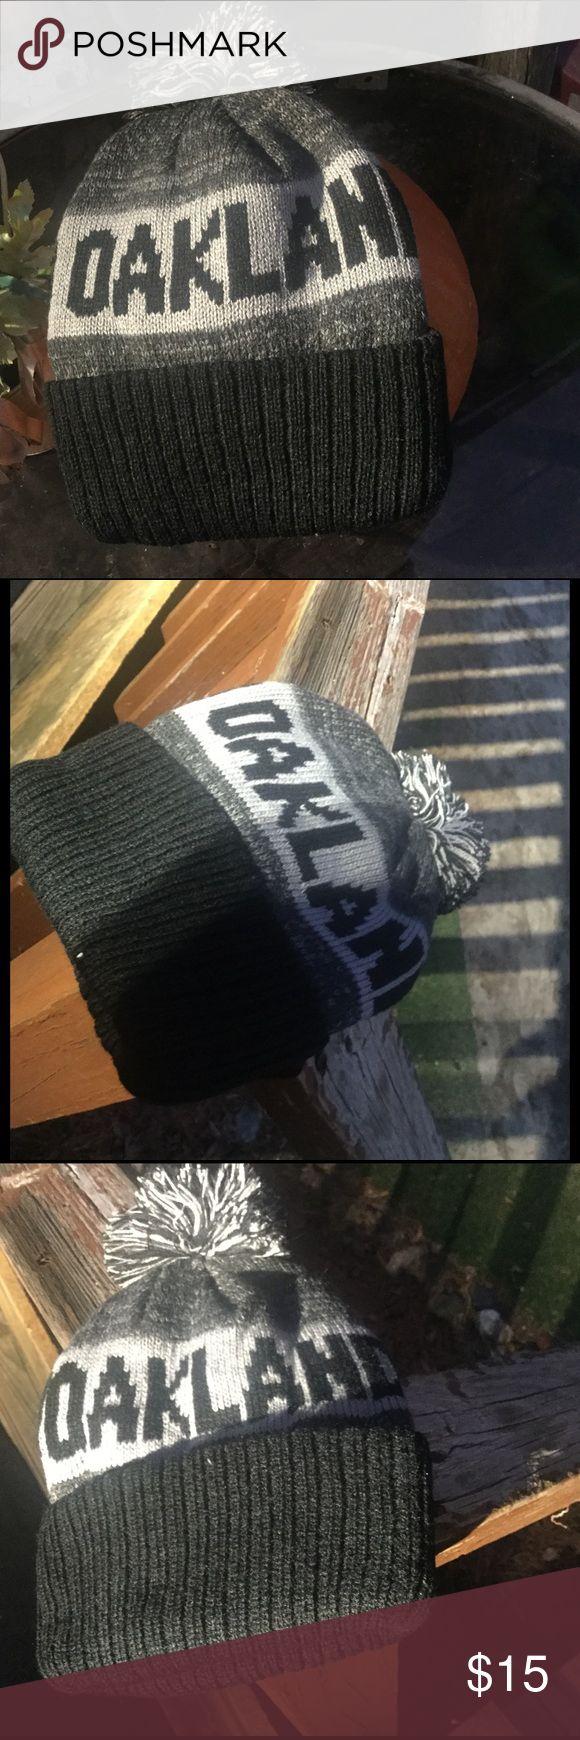 NWOT Oakland Raiders Beanie NWOT Oakland Raiders Beanie Accessories Hats